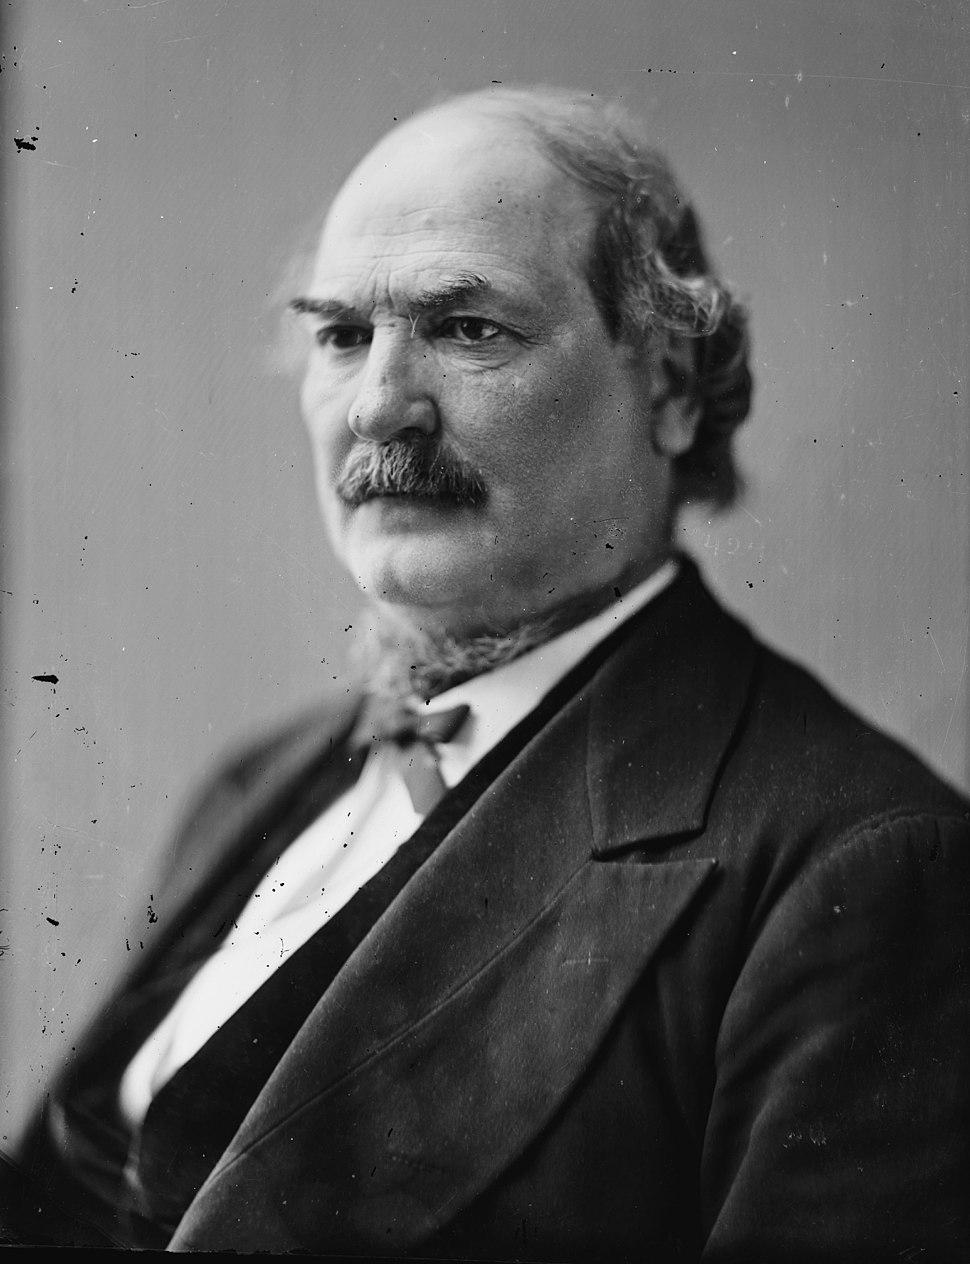 Joseph E. McDonald - Brady-Handy